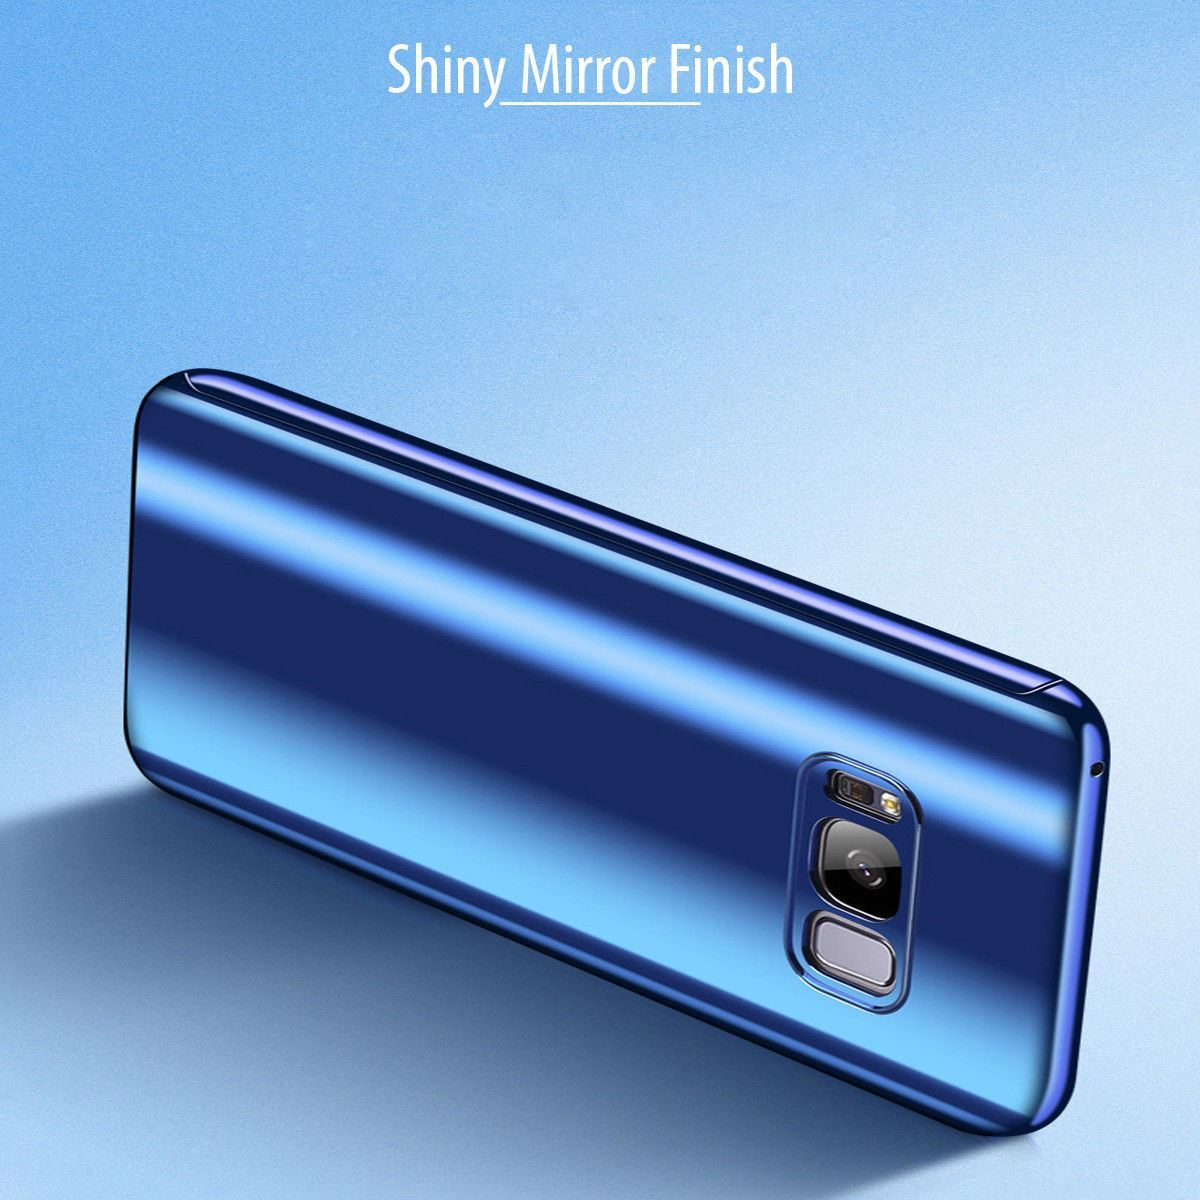 Shockproof-Hybrid-360-Ultra-Thin-Mirror-Hard-Case-Samsung-Galaxy-S7-edge-S8-S9 thumbnail 17